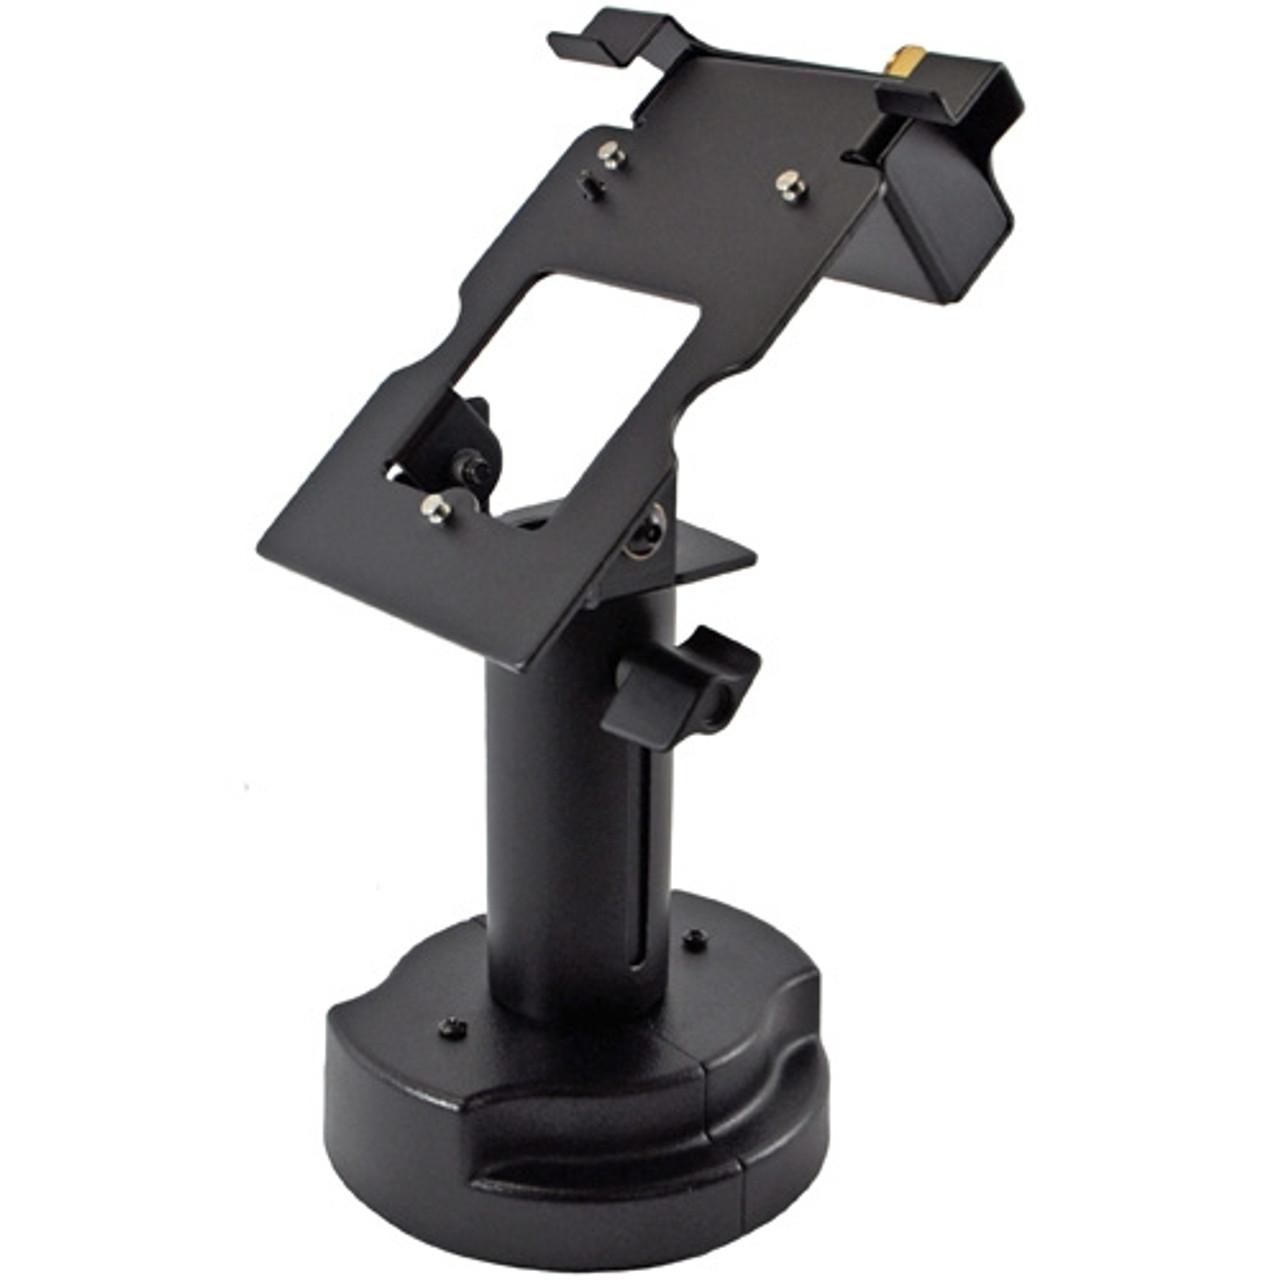 Swivel Stands Credit Card Stand Locking Telescoping Pedestal VeriFone MX915